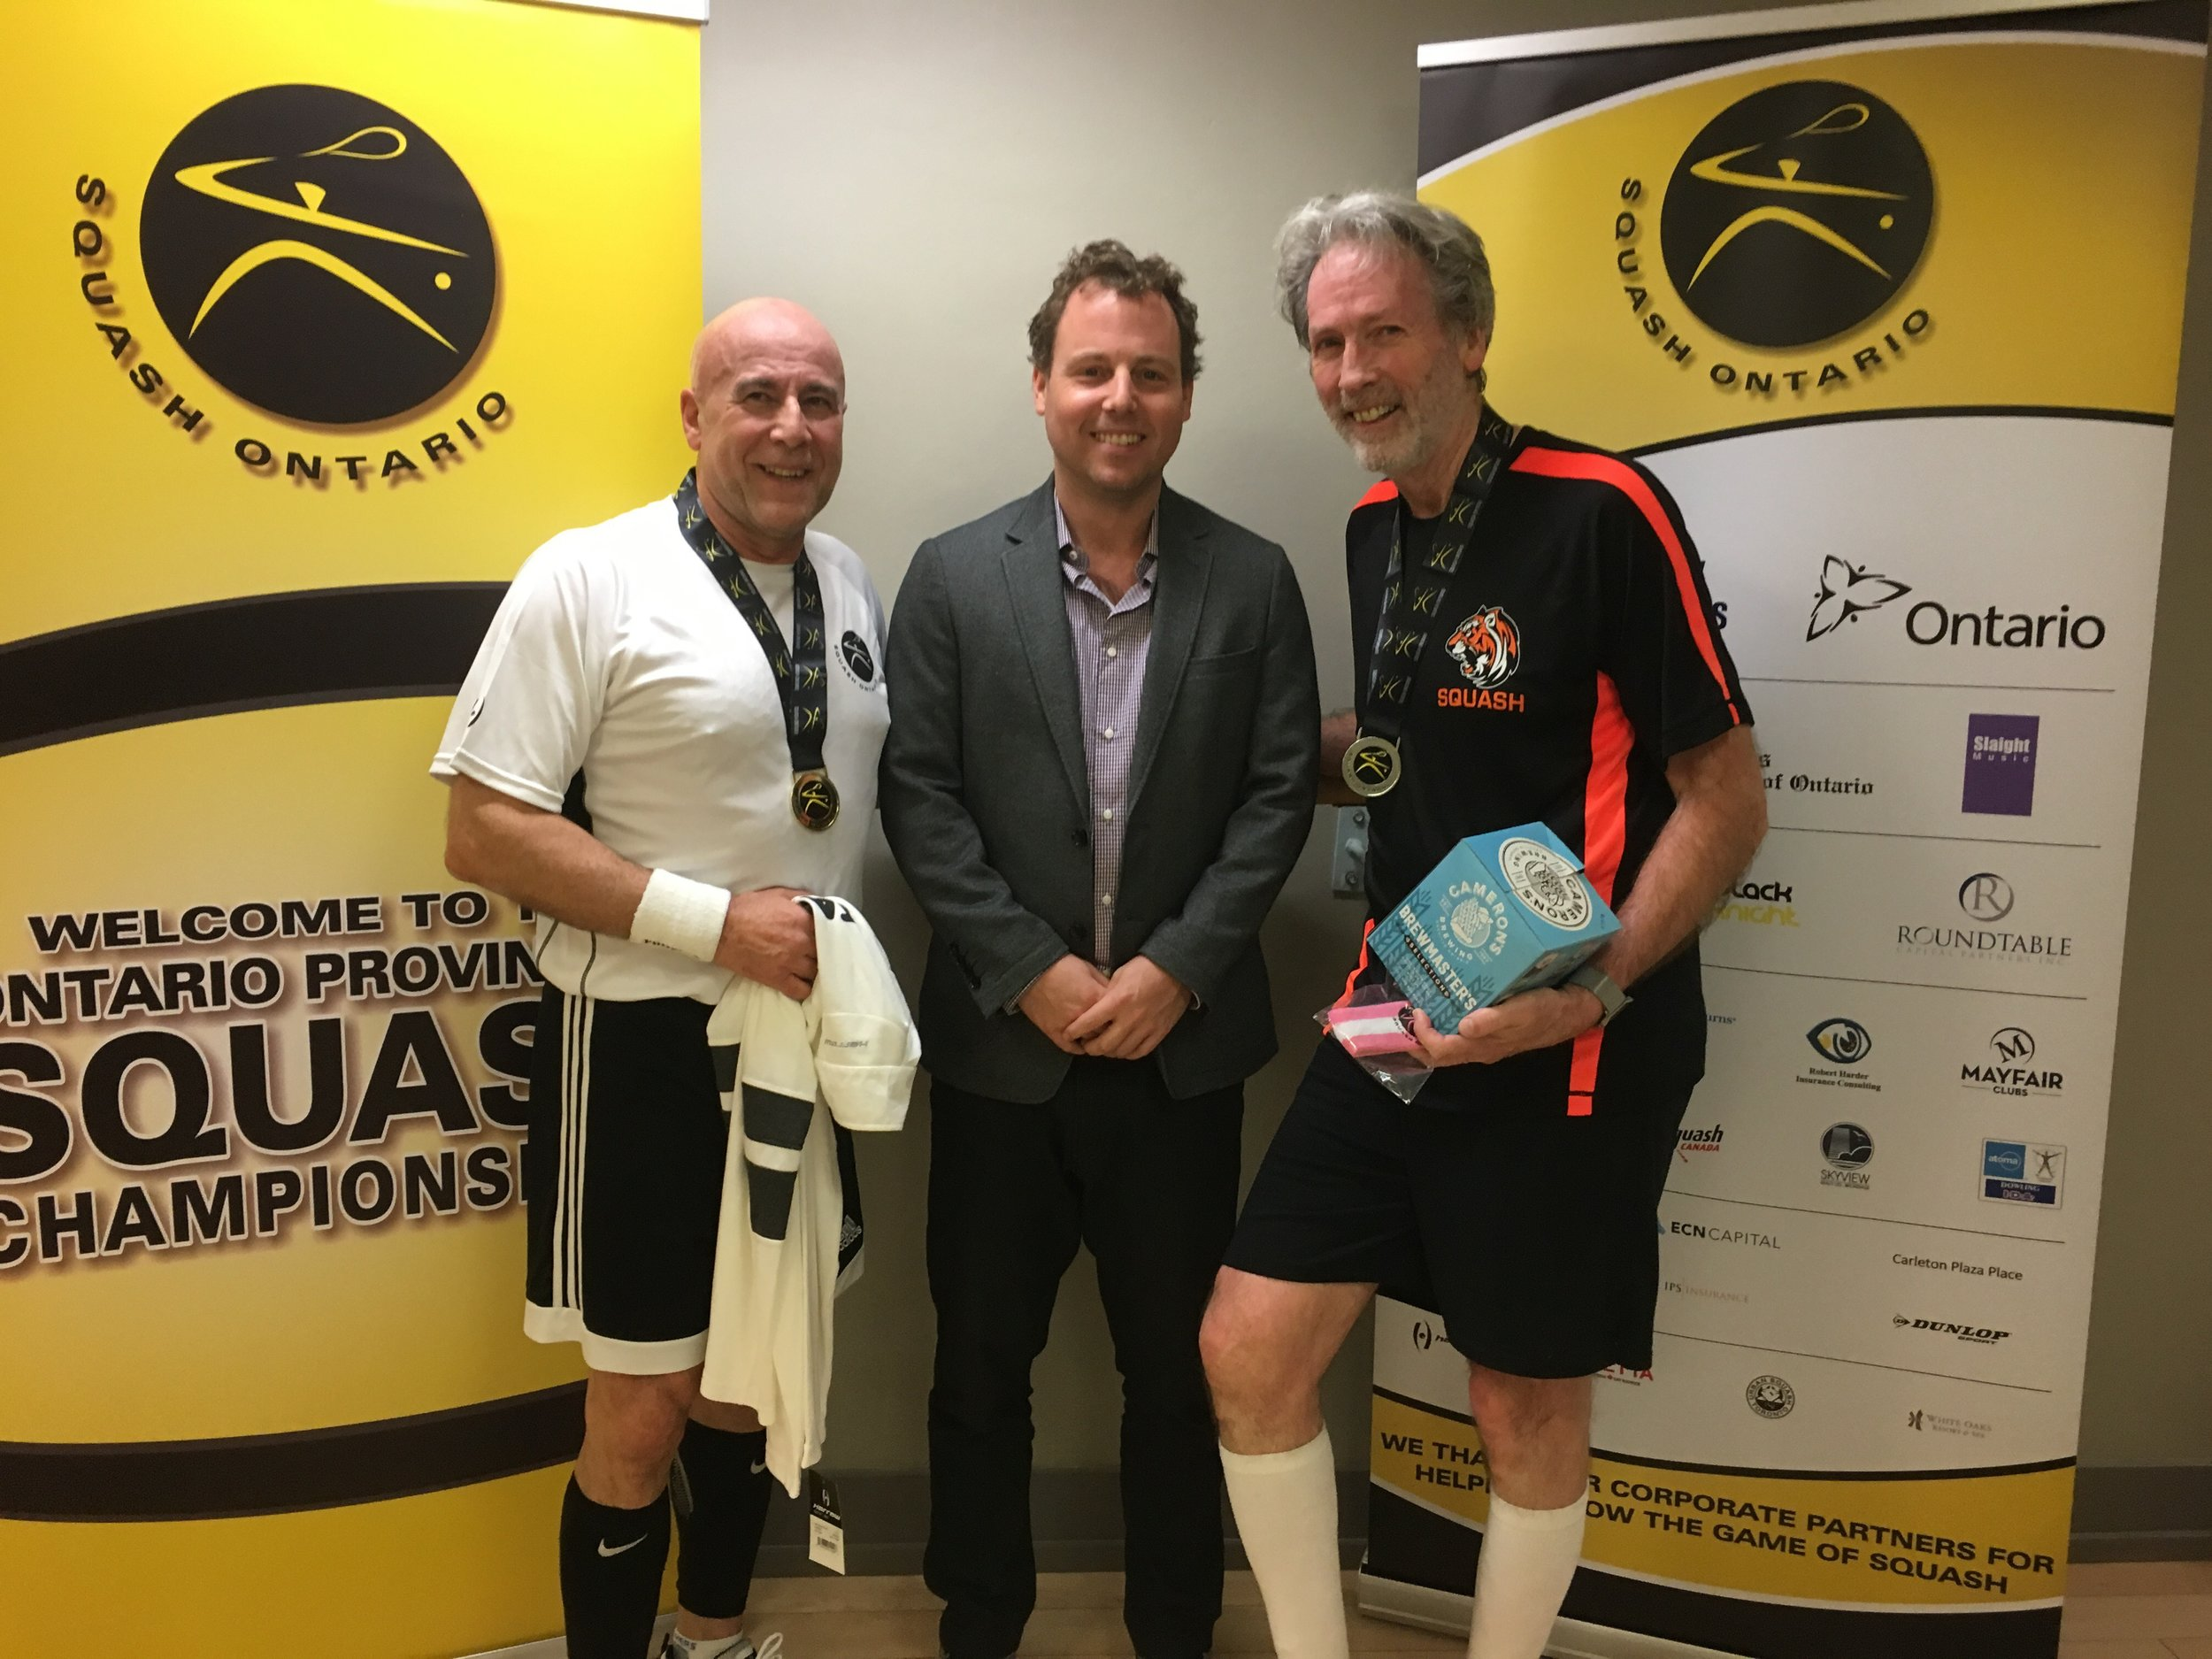 L-R: Mario Raponi, Squash Ontario's Jamie Nicholls, David Forgeron